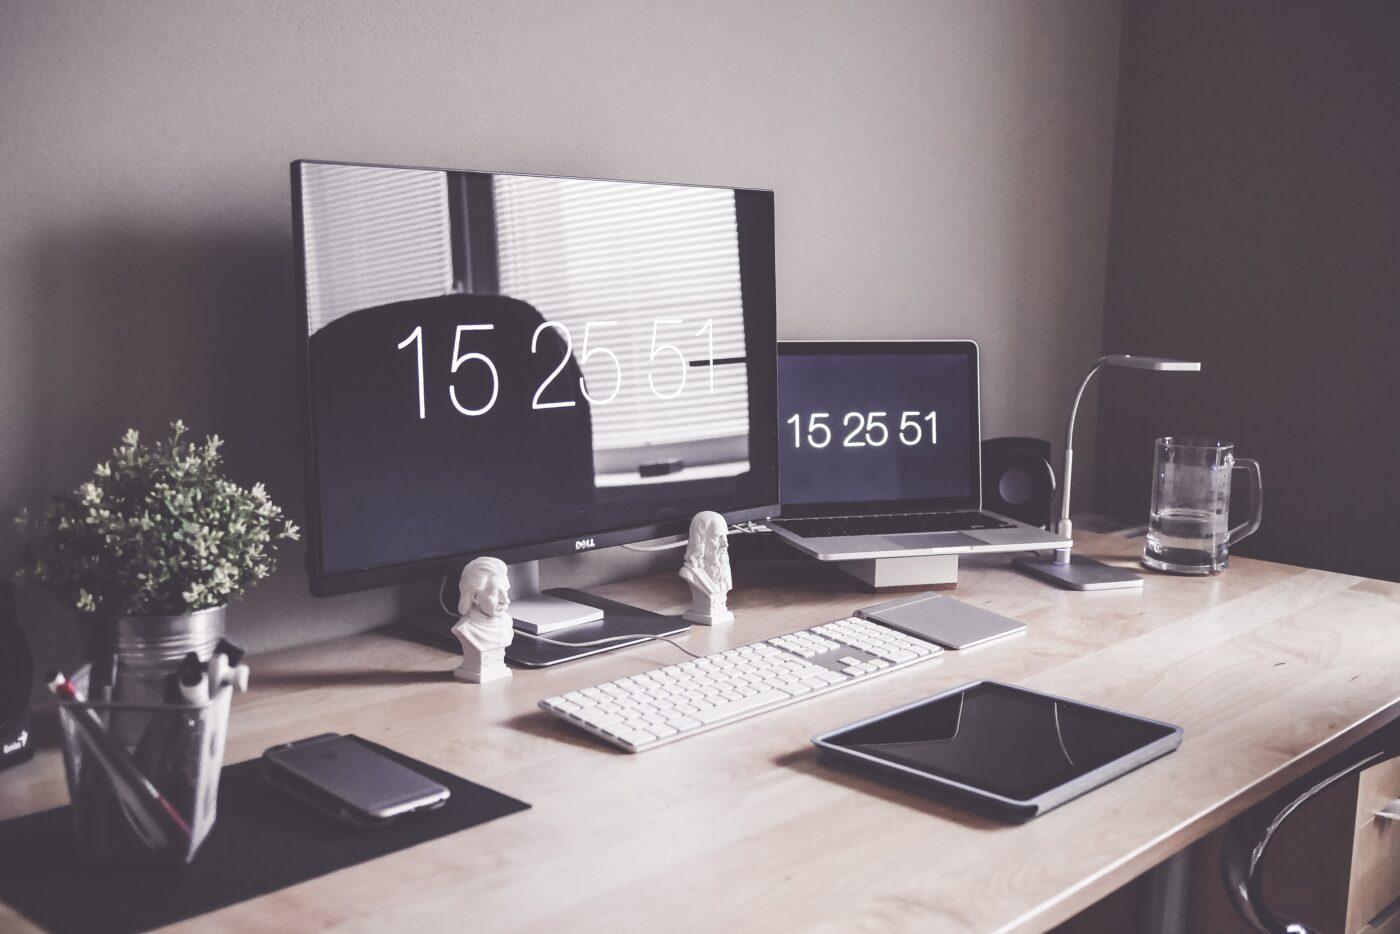 noleggio pc fissi tablet notebook task servizi cuneo